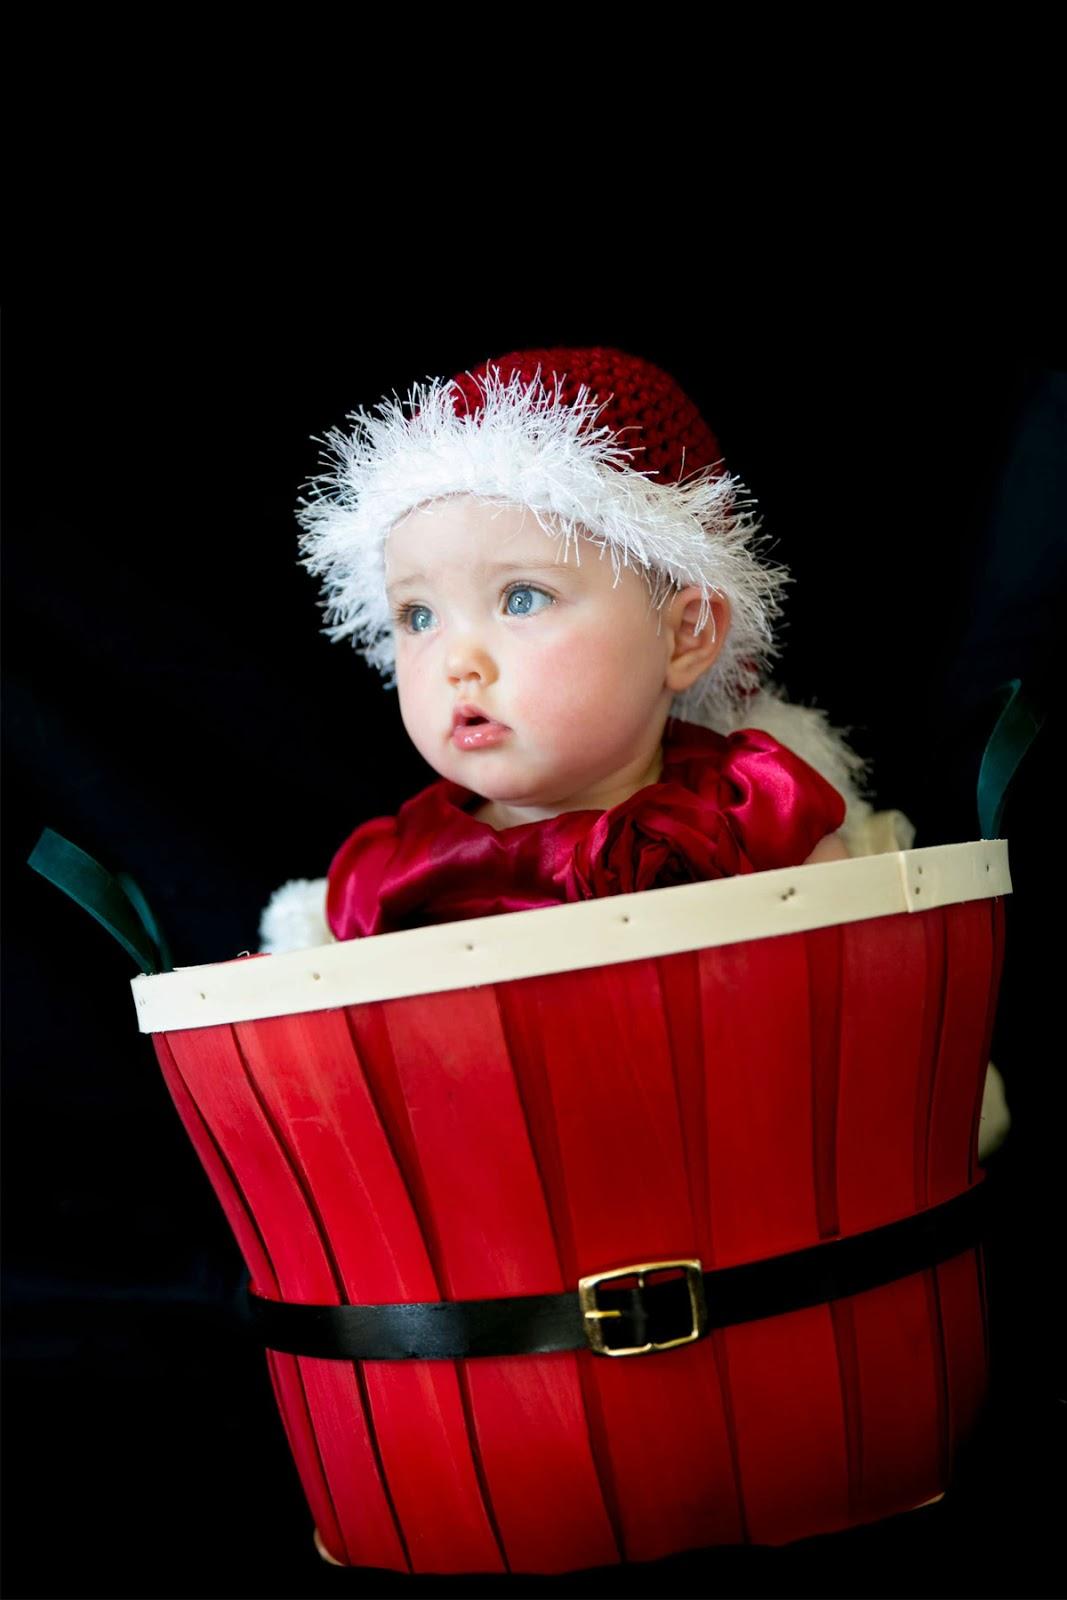 Rakul Preet Singh Cute Hd Wallpapers Christmas Babies Hd Wallpapers Hd Wallpapers High